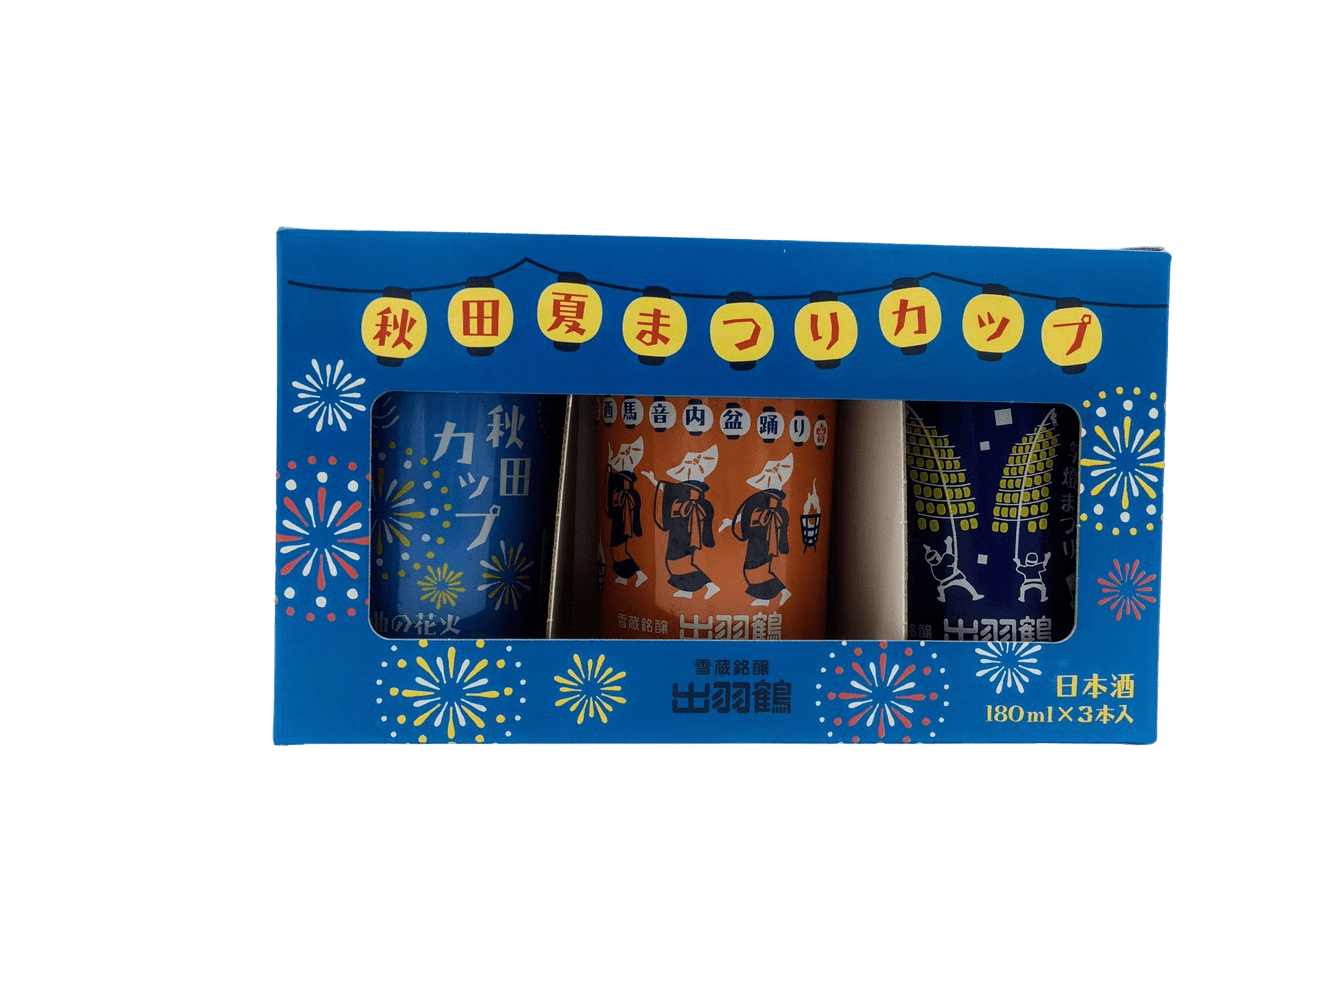 ZEN 清酒日常 - 出羽鶴 夏祭杯裝純米酒[180ml x 3]